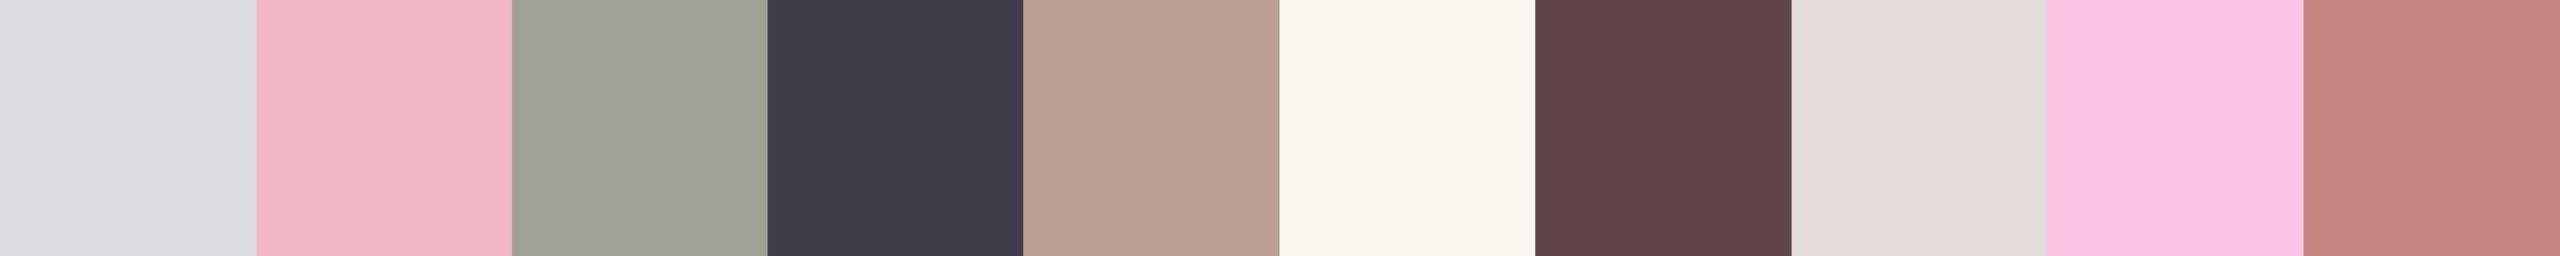 457 Kamaftila Color Palette